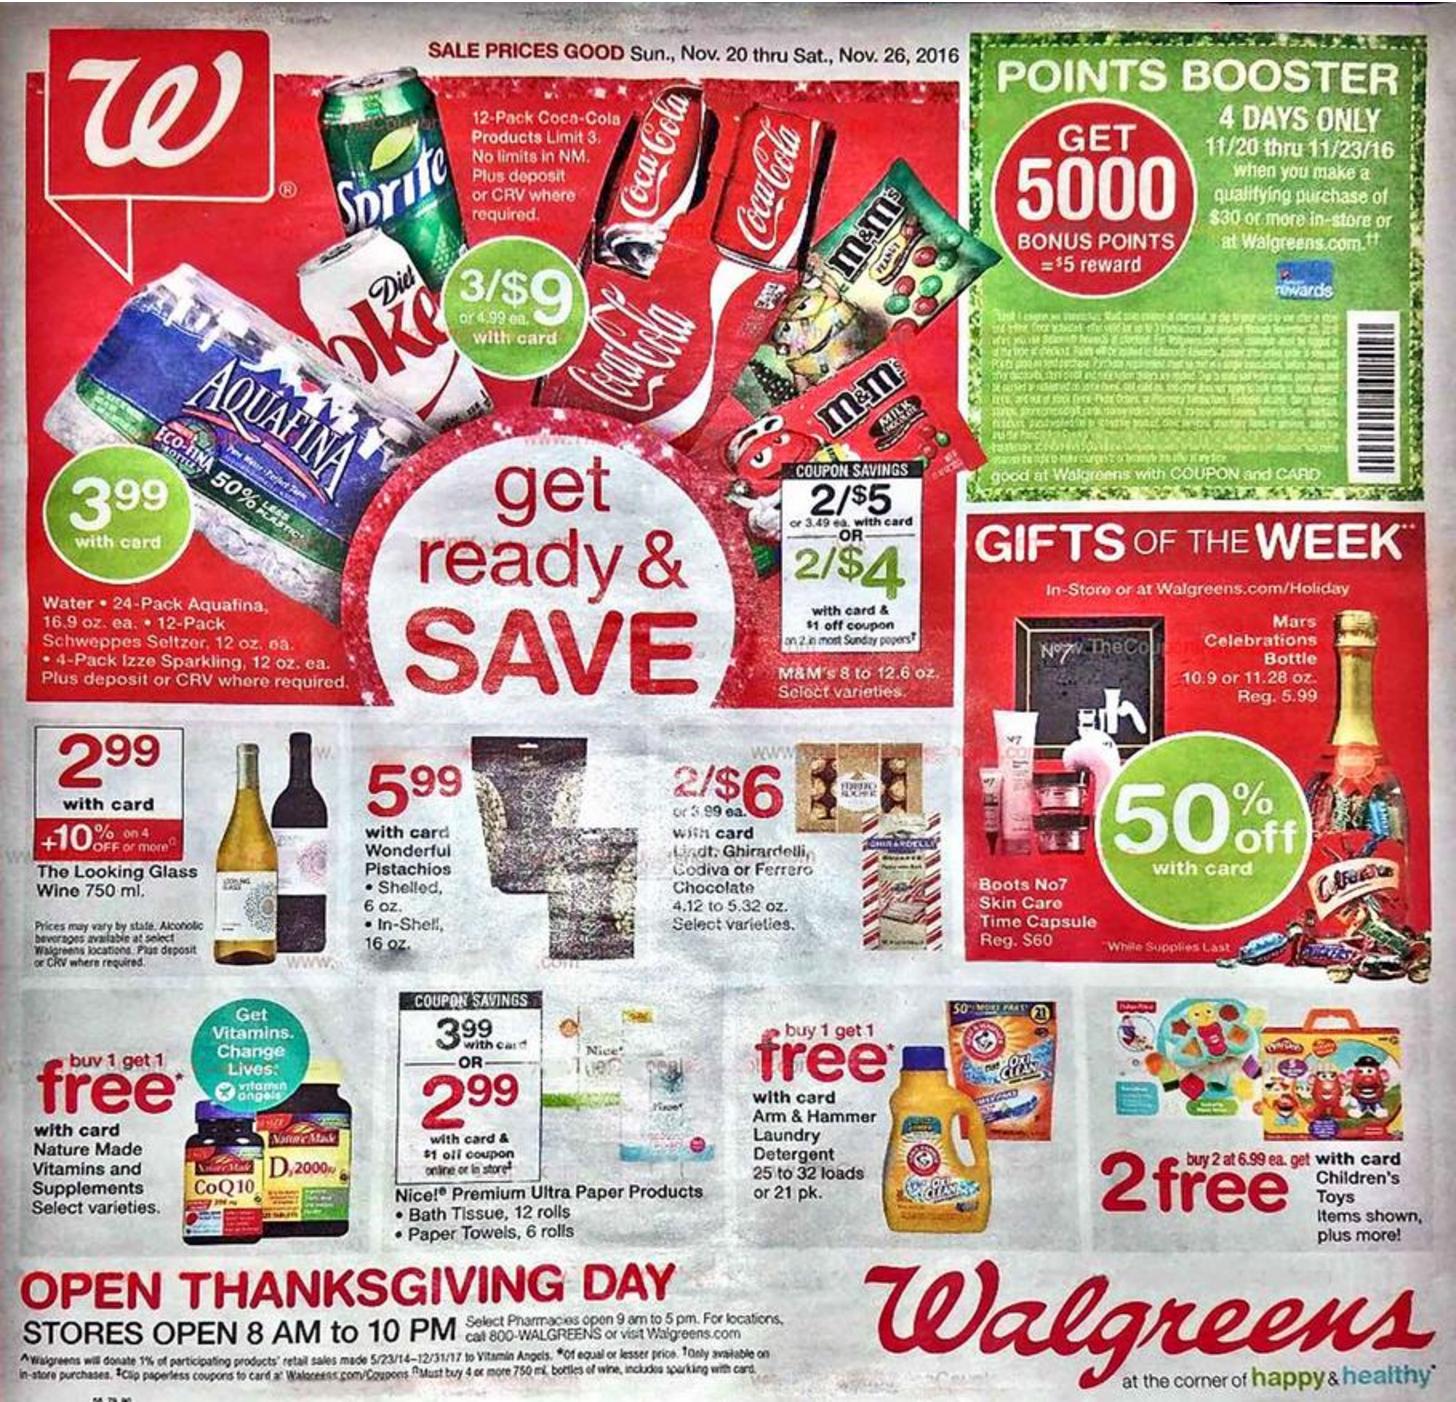 Walgreens Black Friday 2016 Ad — Find the Best Walgreens Black ...